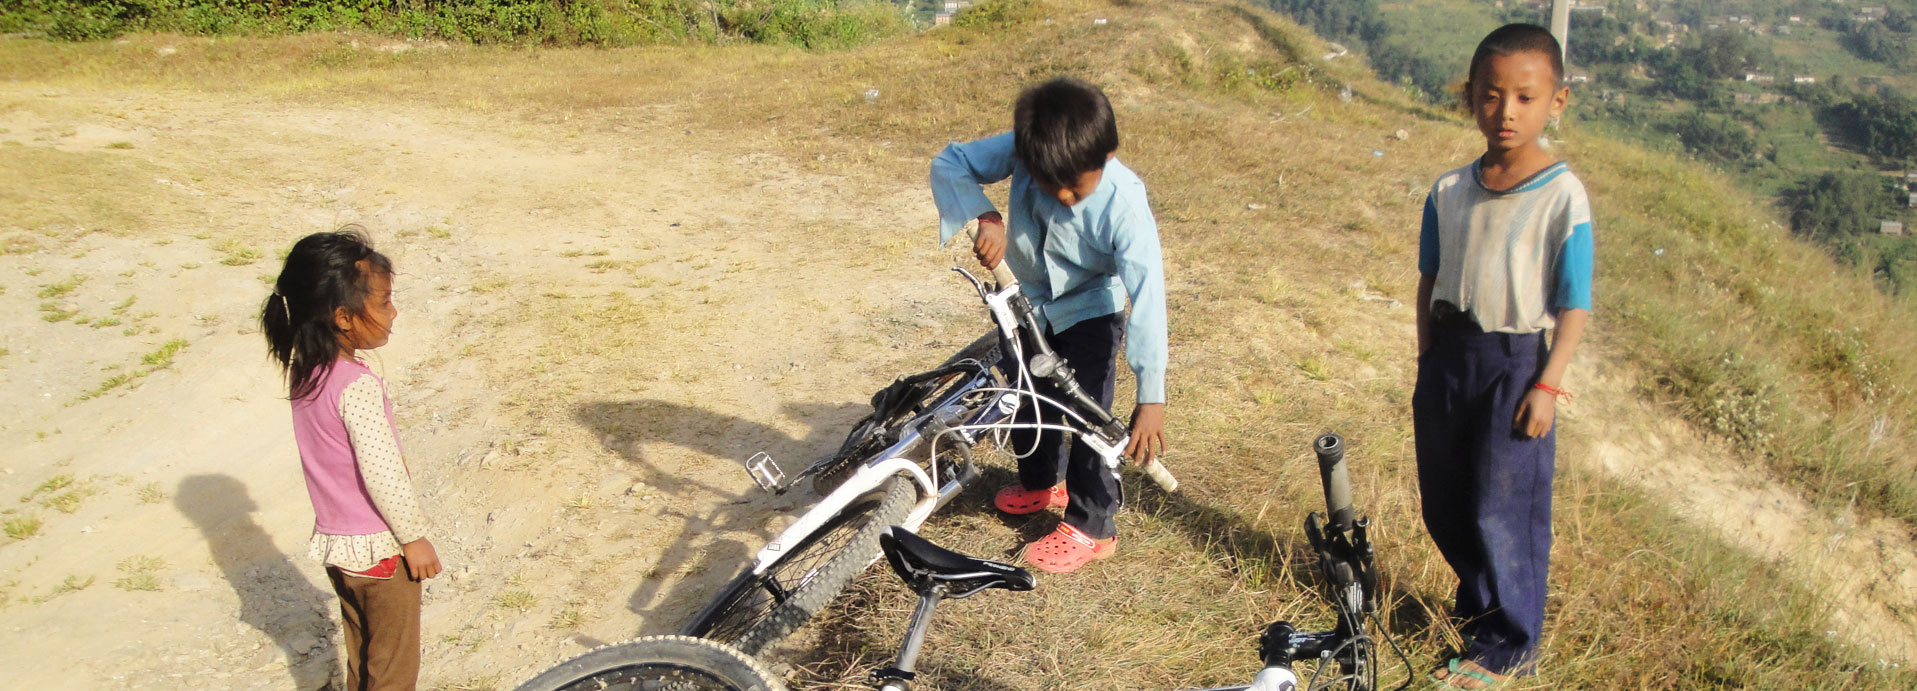 Overnight Kathmandu Biking Tour